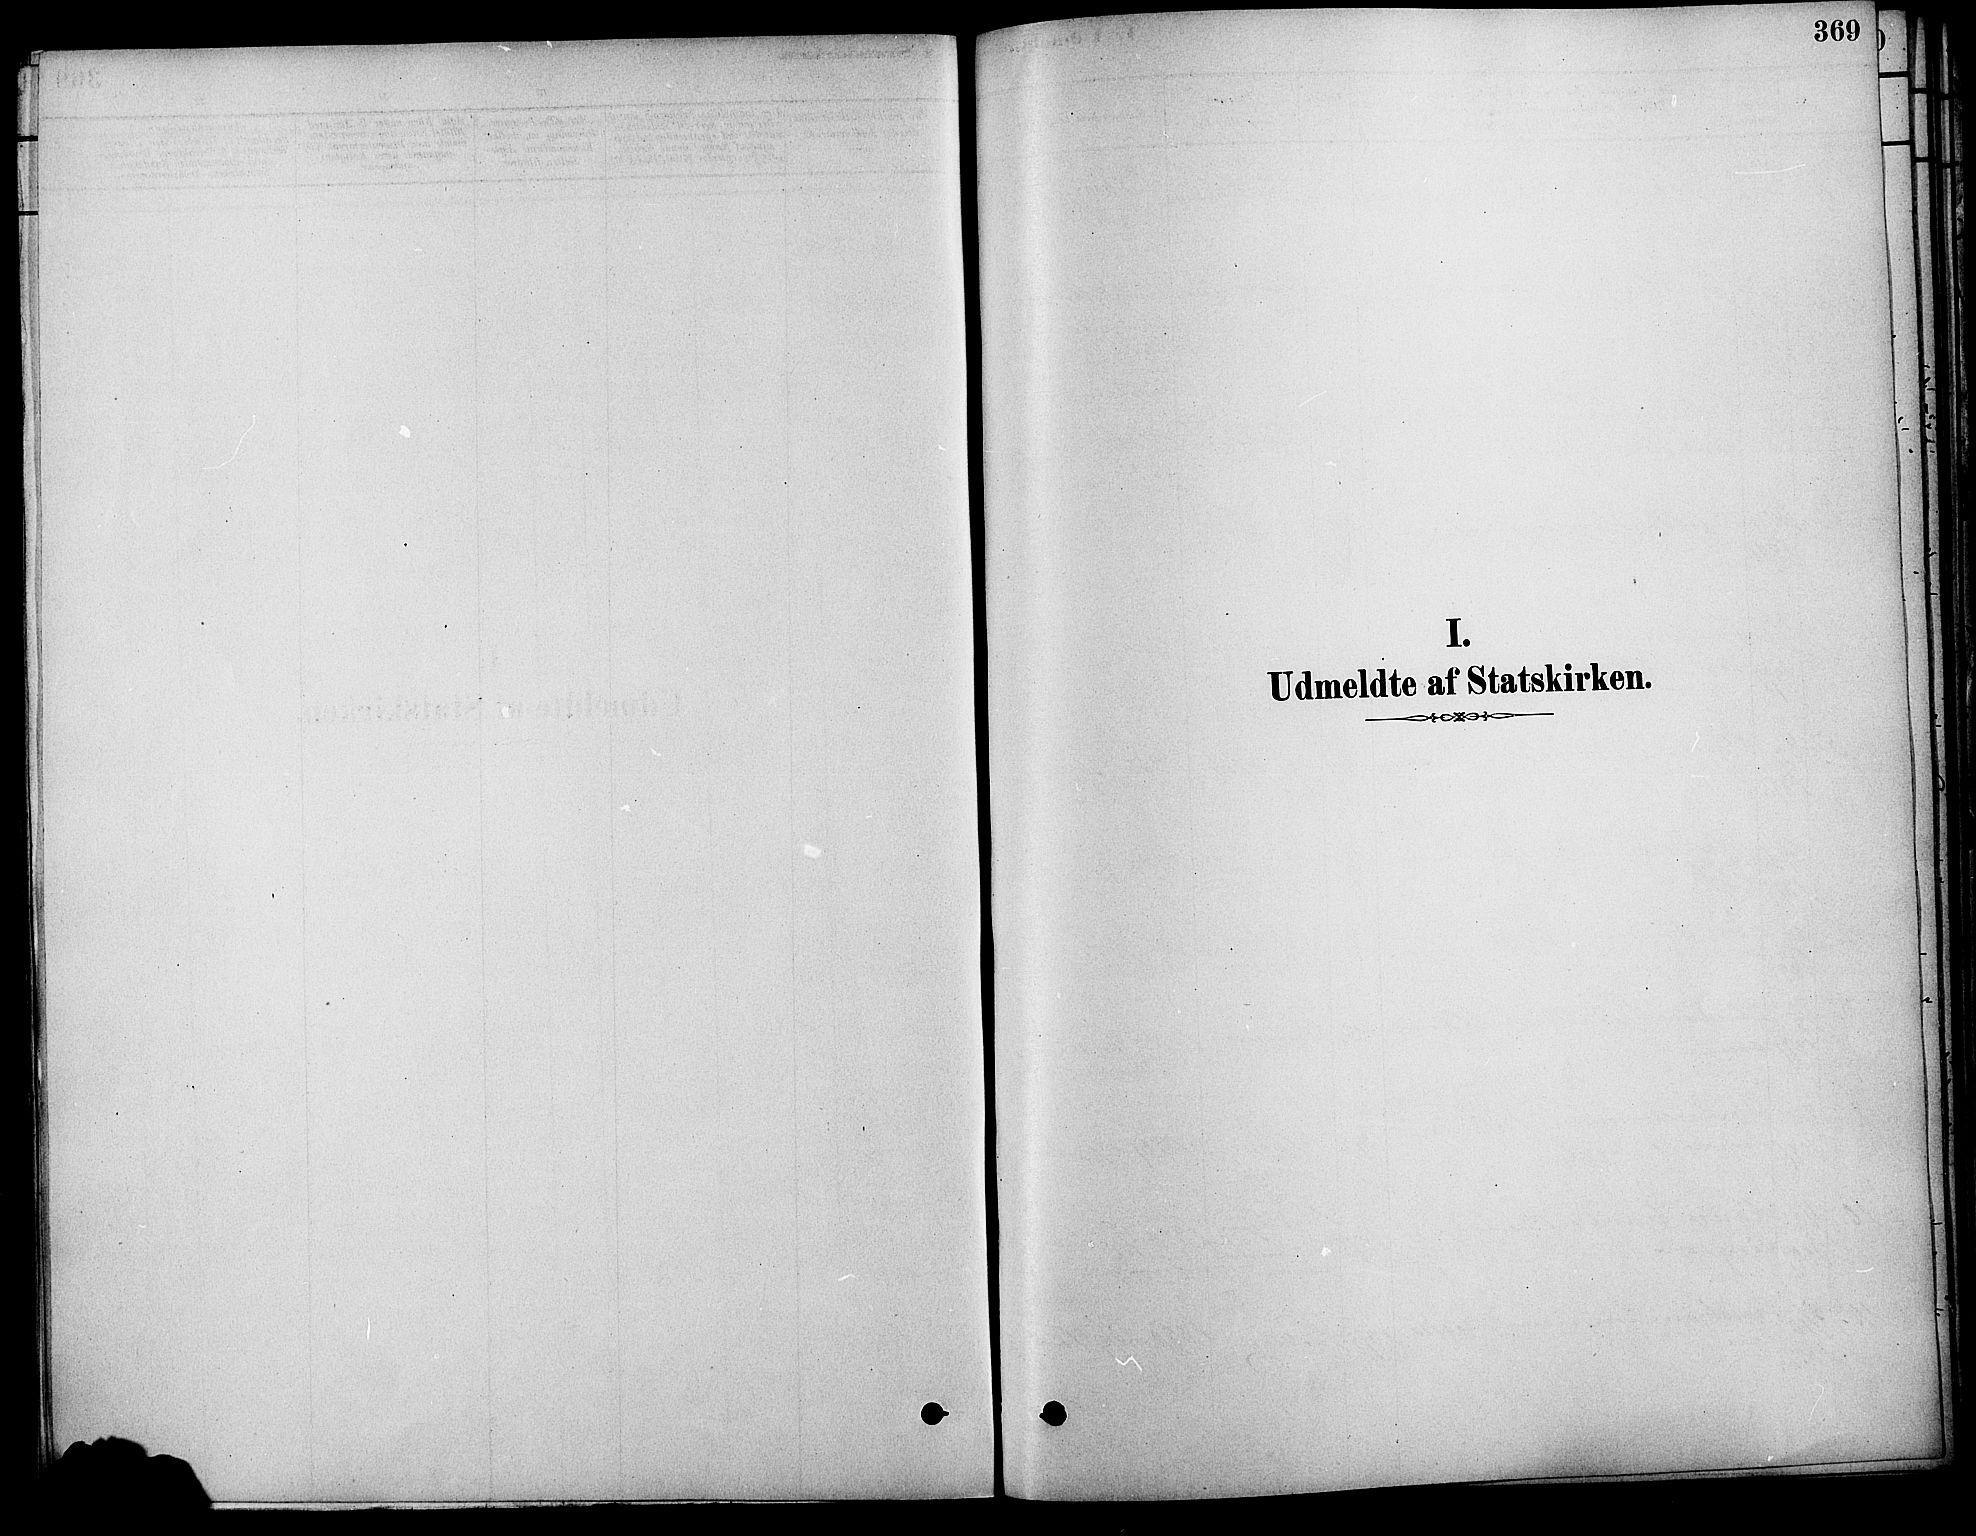 SAH, Fåberg prestekontor, Ministerialbok nr. 8, 1879-1898, s. 369